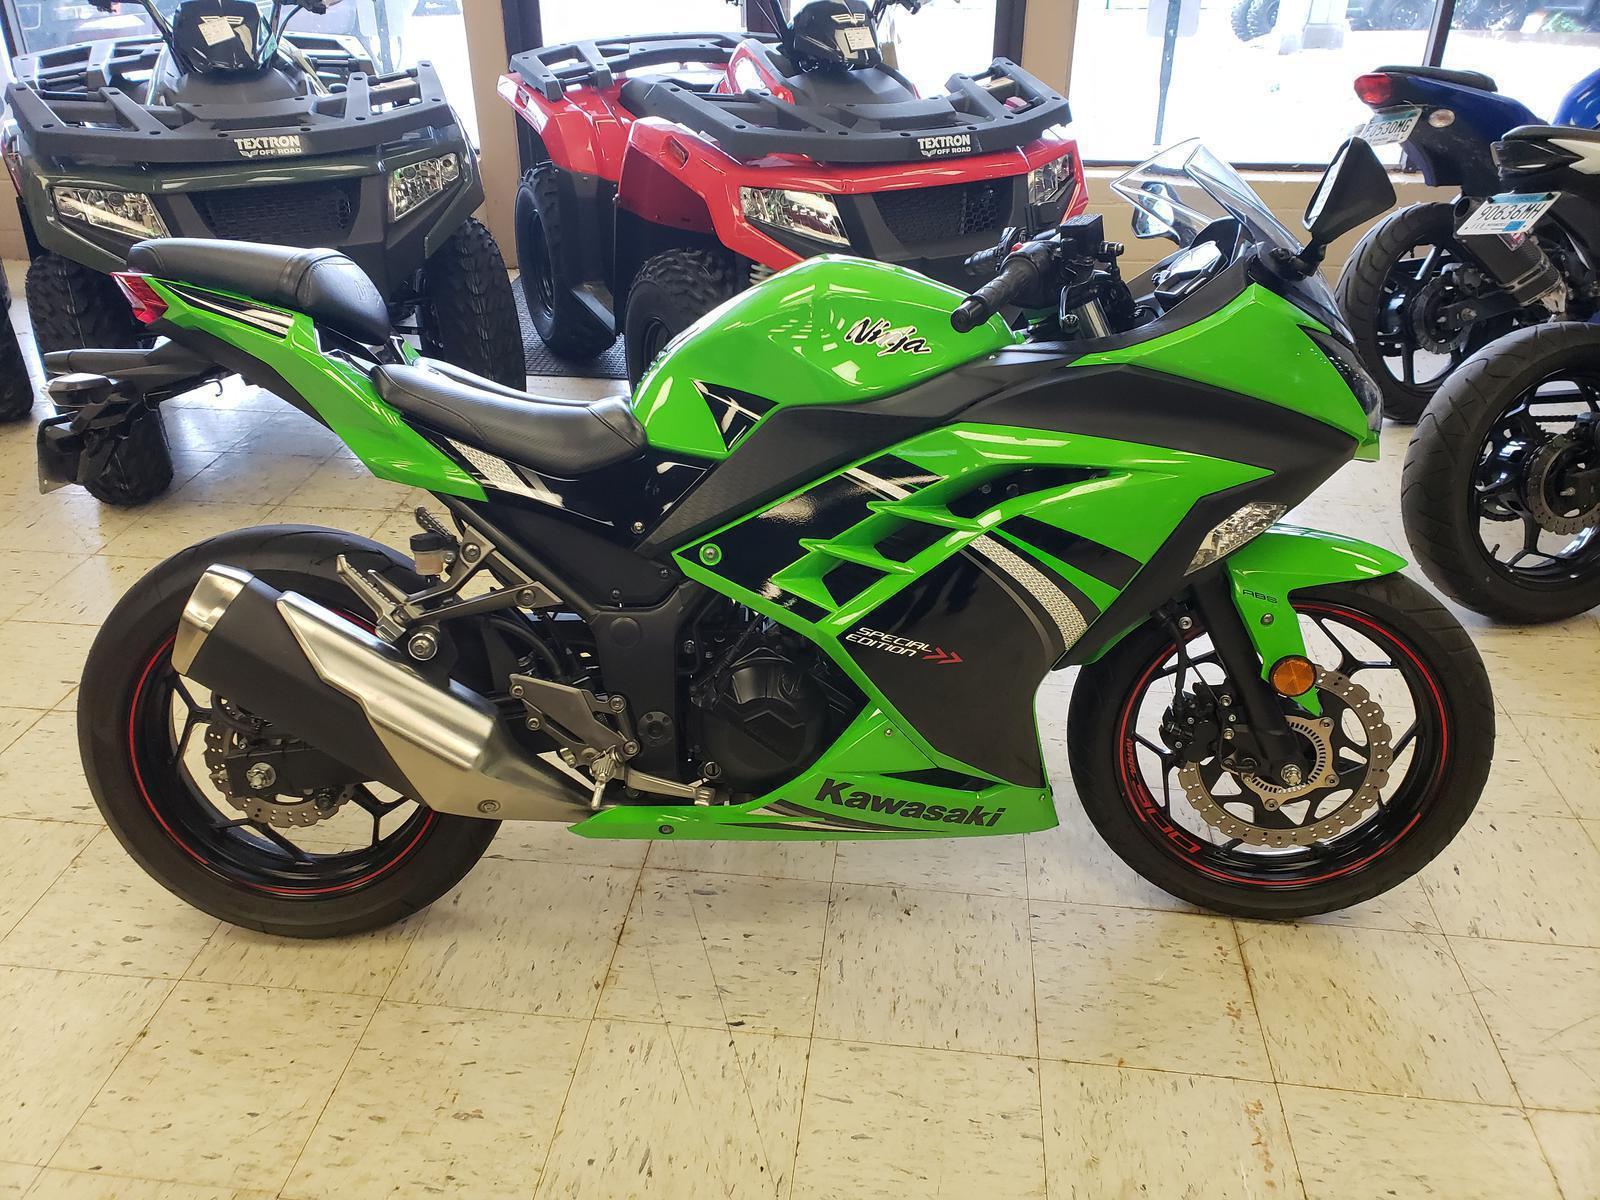 2014 Kawasaki Ninja 300 Abs For Sale In Shakopee Mn Cities Edge